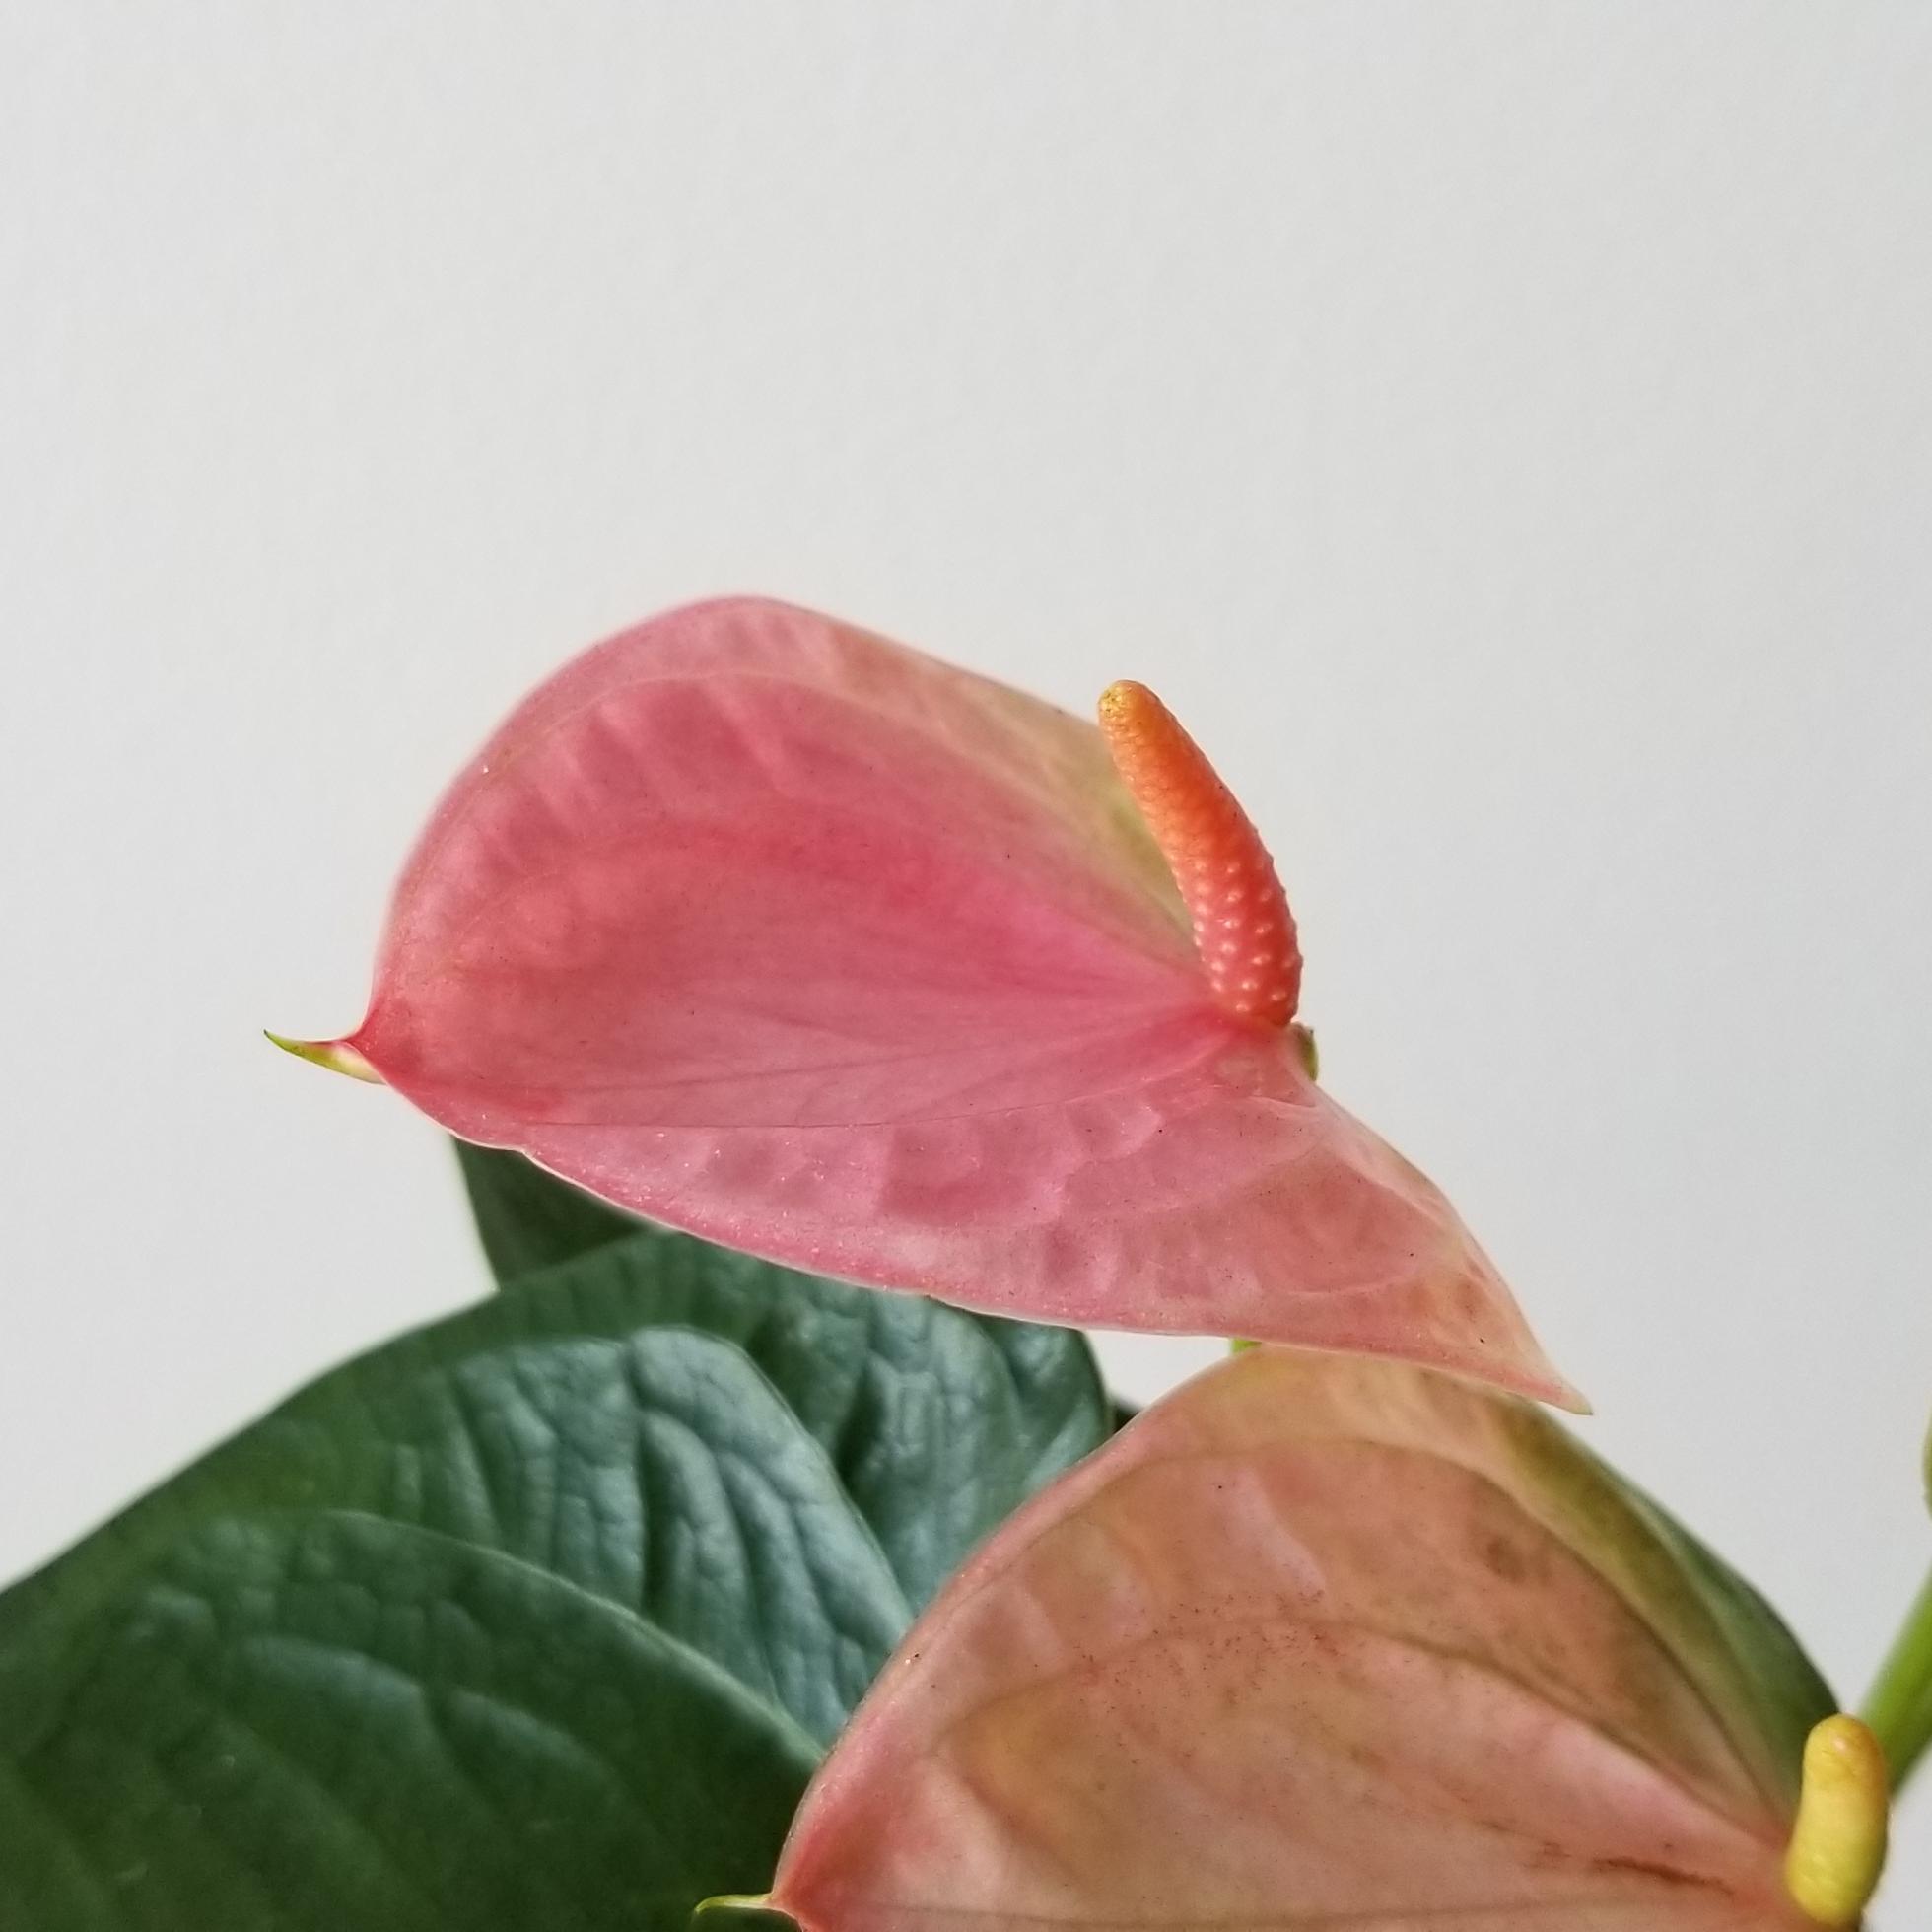 Indoor plants houseplant sale Interiorplants plant gifts Mississauga Toronto Etobicoke Brampton Burlington Hamilton Oakville Ontario Richmond Hill North York GTA Flower filled gifts Anthurium Red in Black Ceramic container Plant Gift air-purifying plants